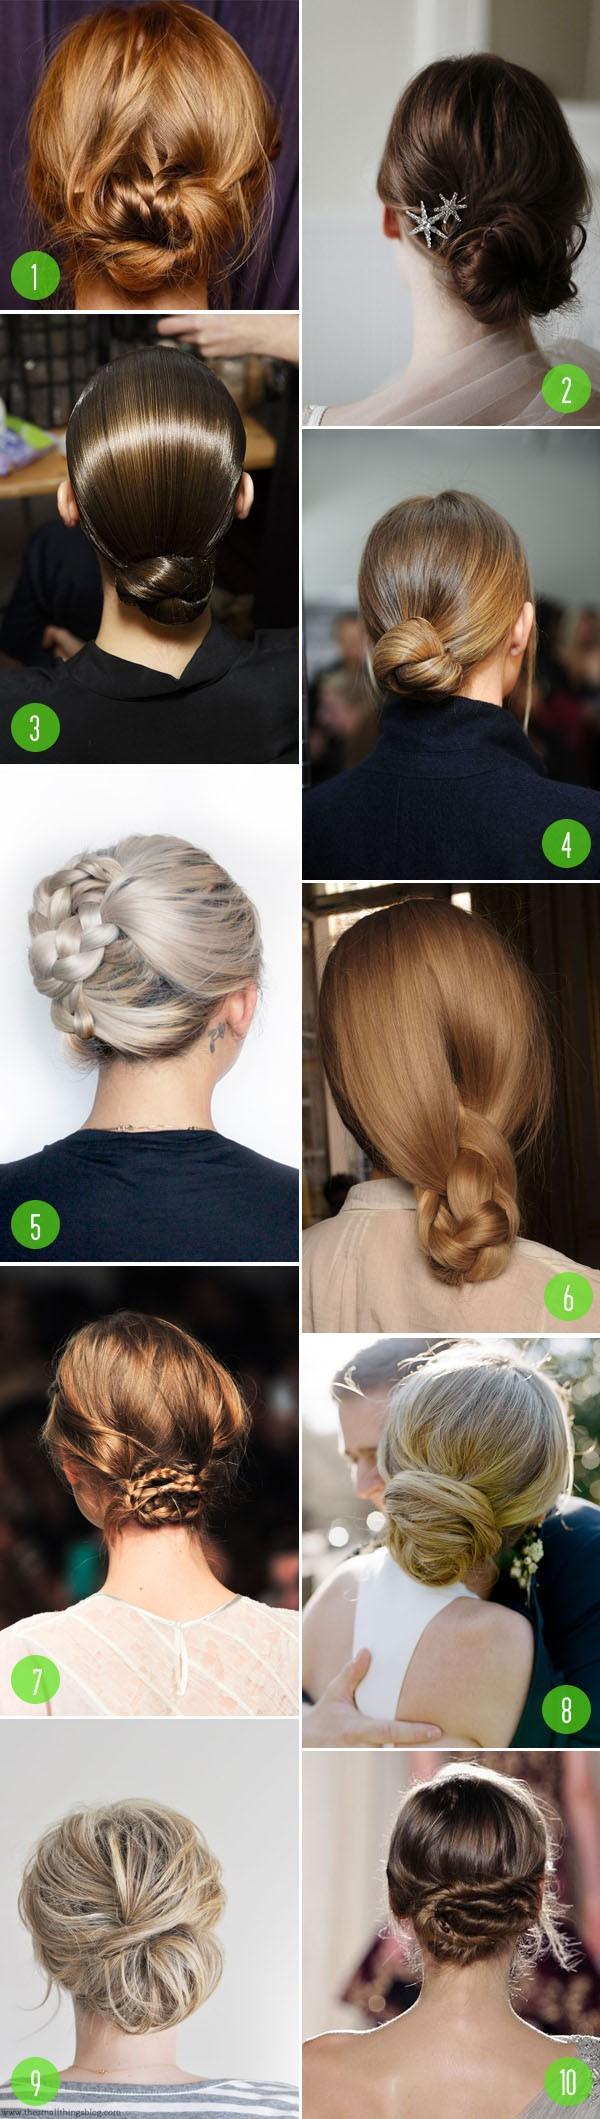 top 10: hair - chignons